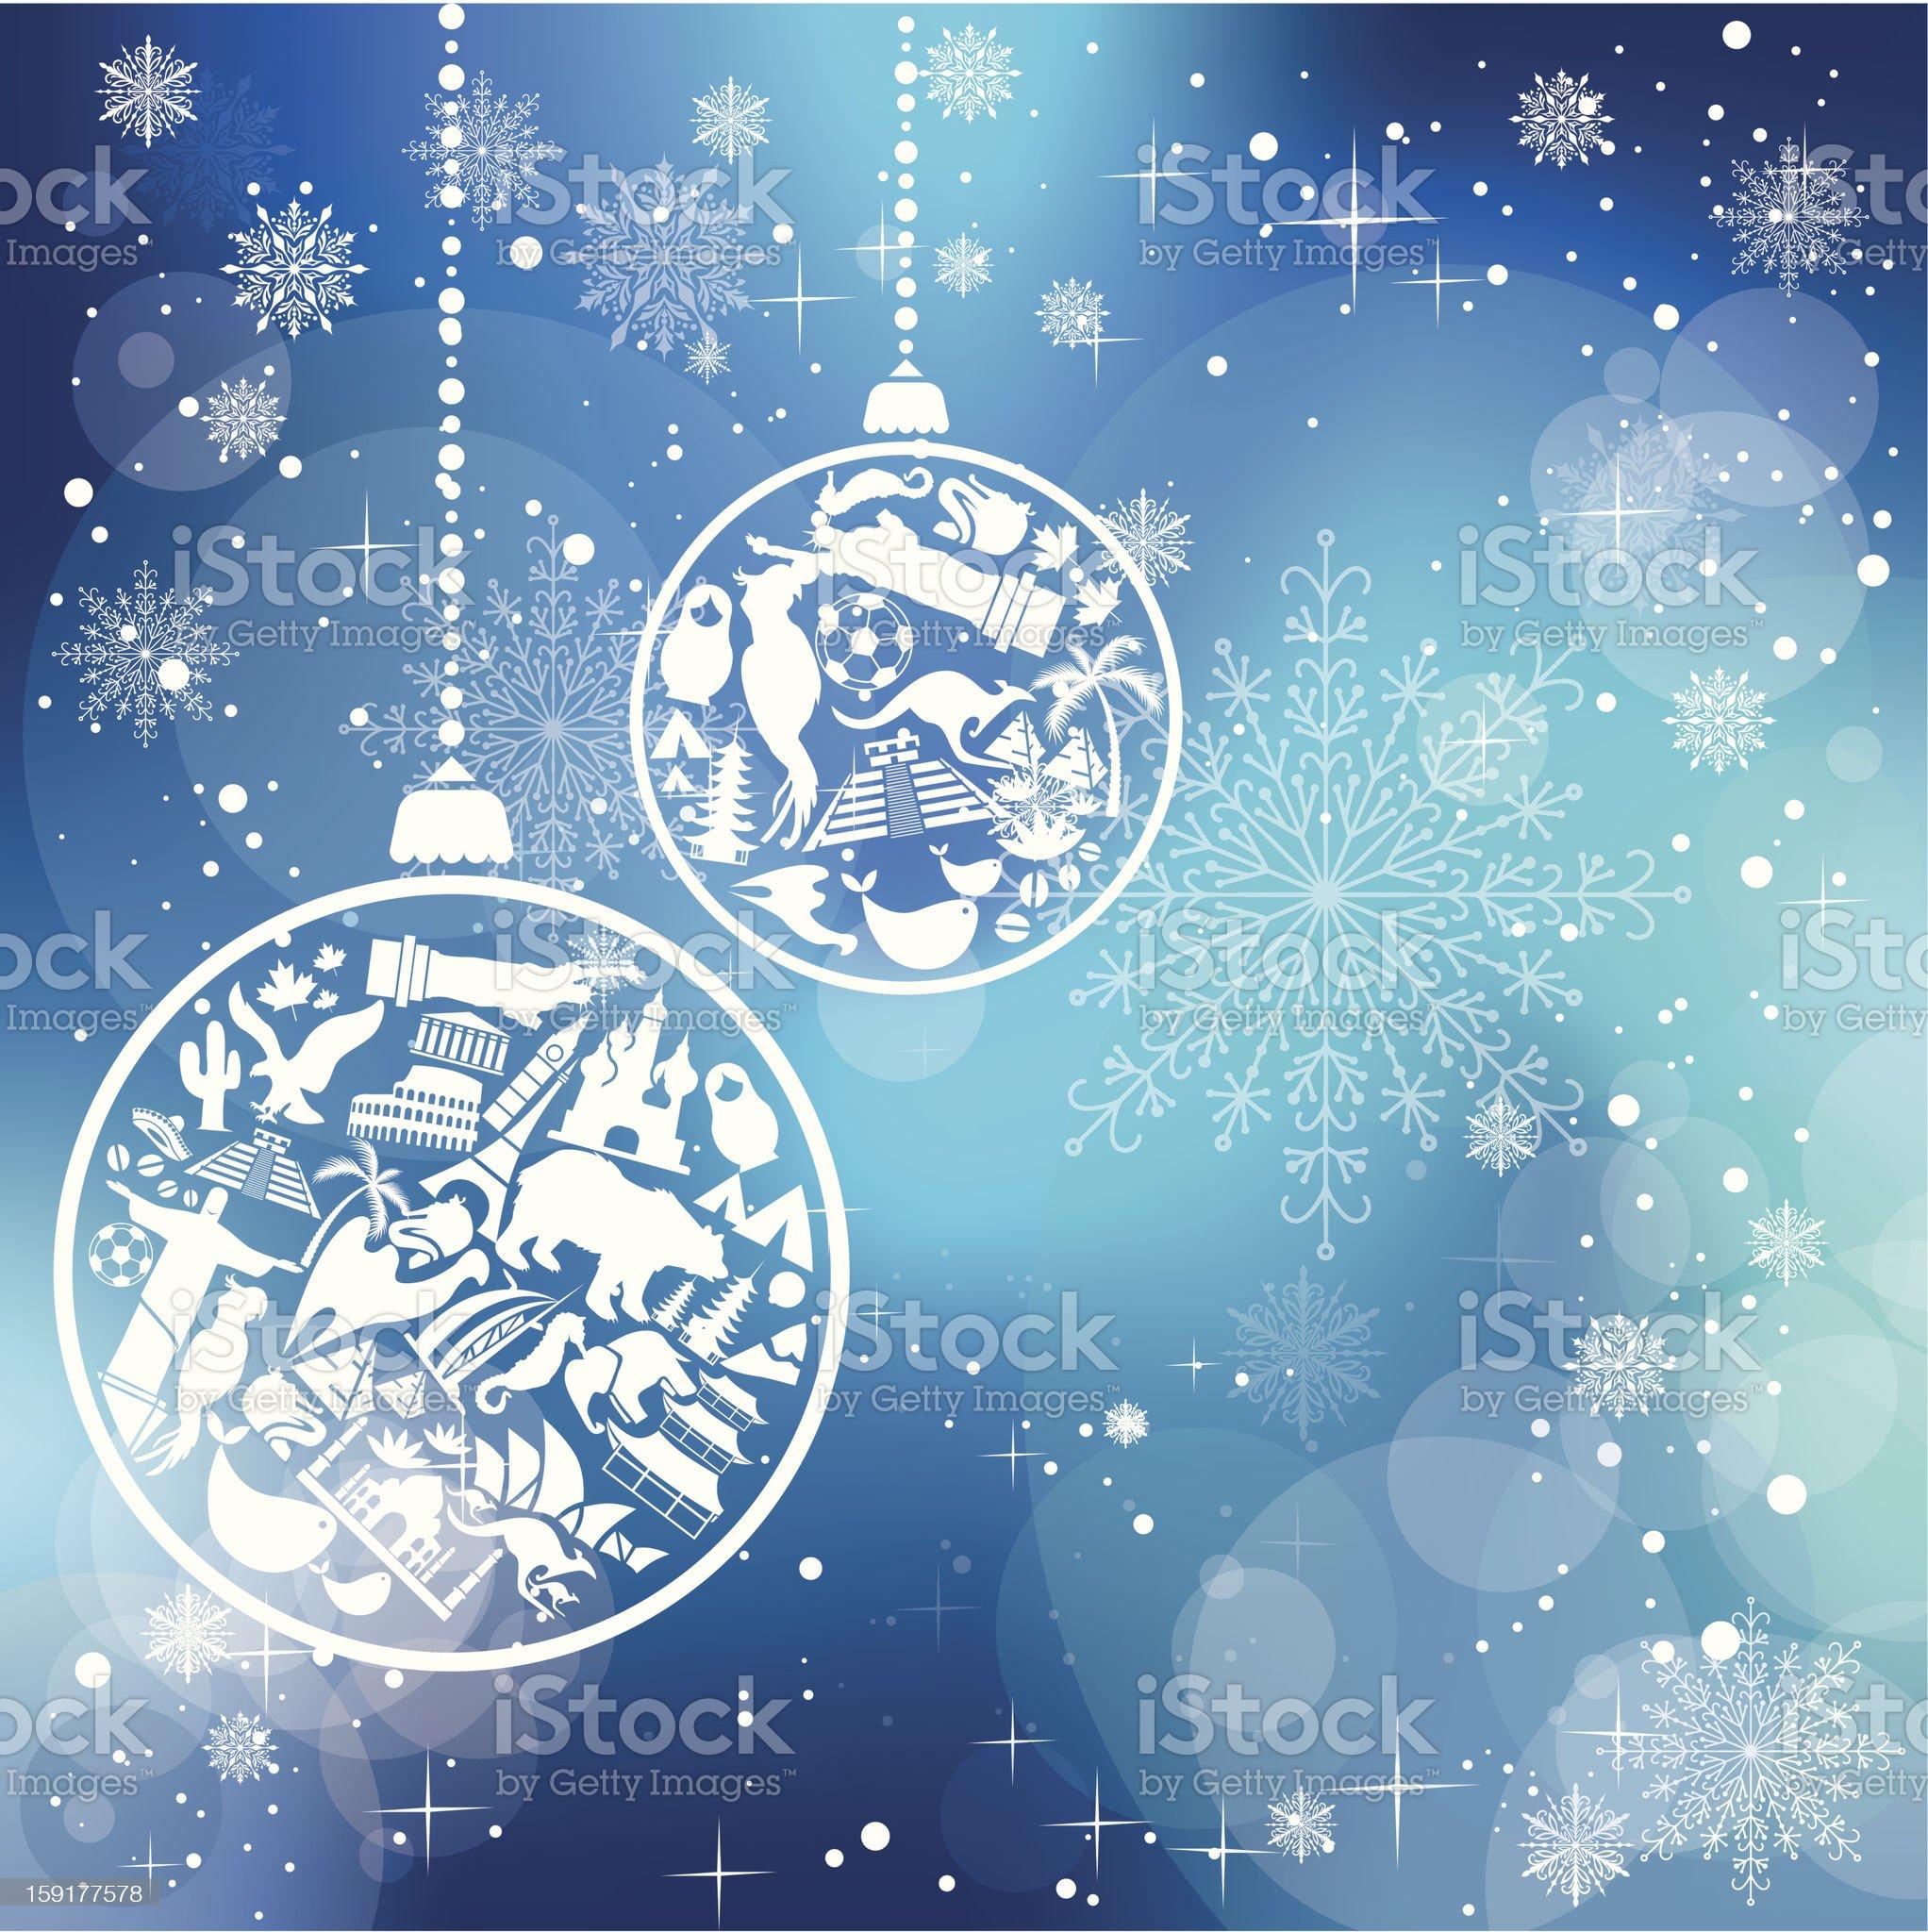 Christmas card with landmarks symbols royalty-free stock vector art